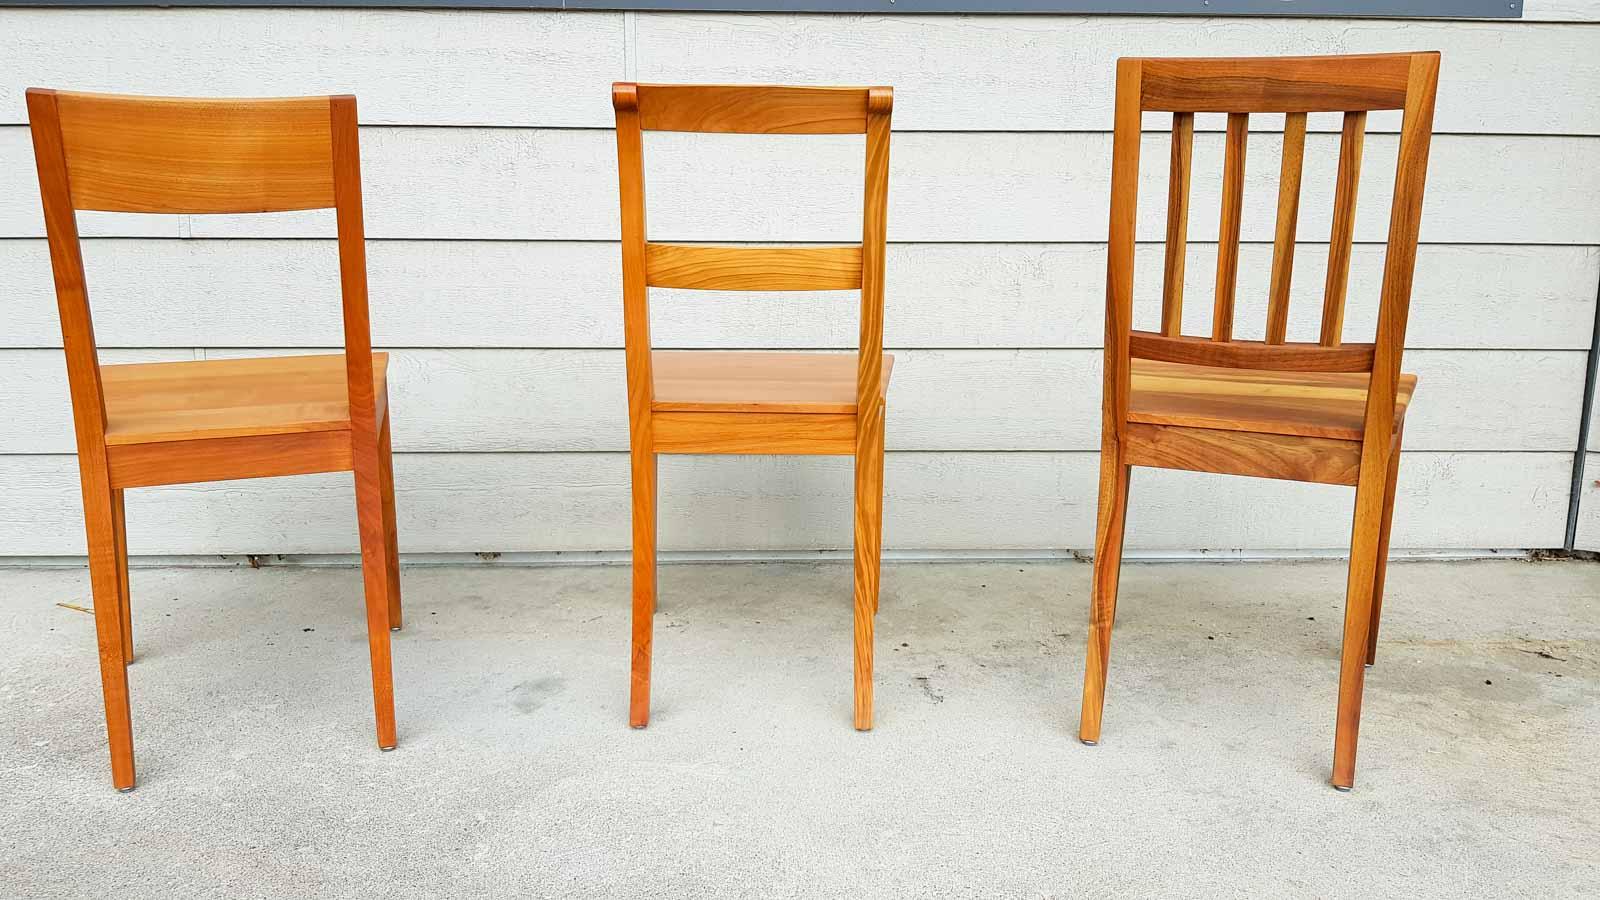 Wooddesign_Holzstühle_Holzstuhl (3)